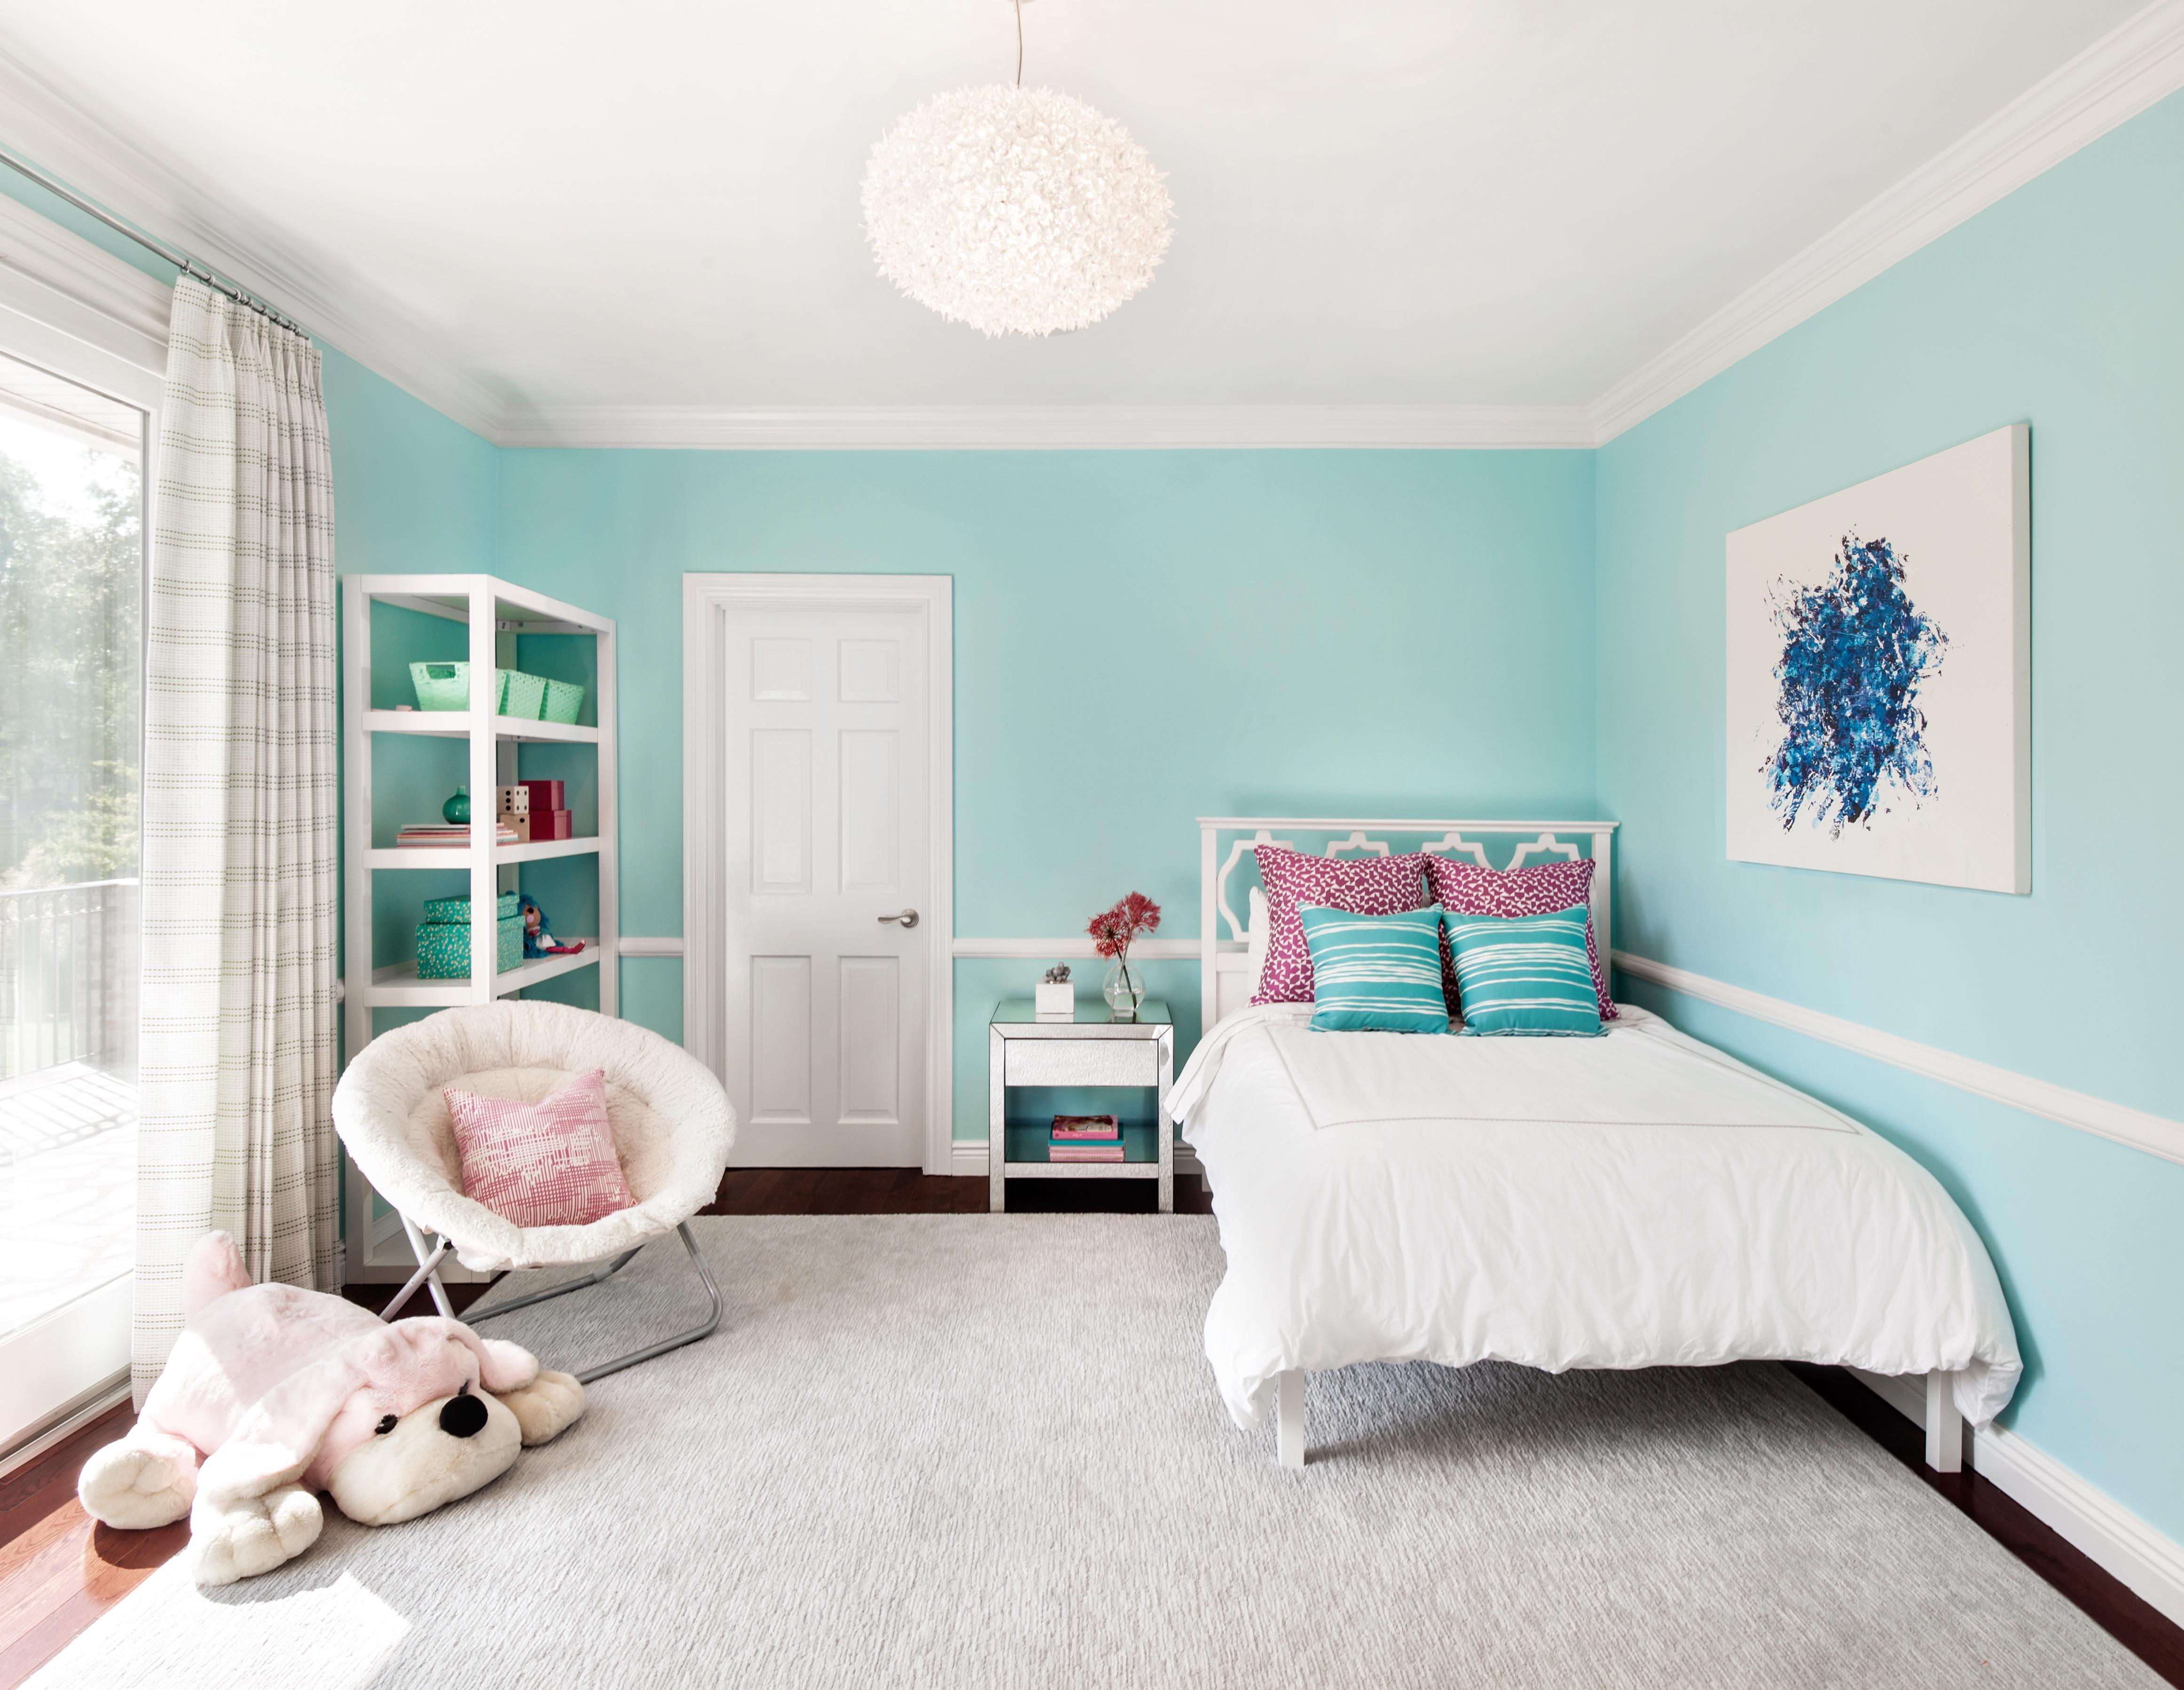 Fun Ideas For A Teenage Girl's Bedroom Decor #16535 ... on Pretty Room Decor For Girl  id=60657